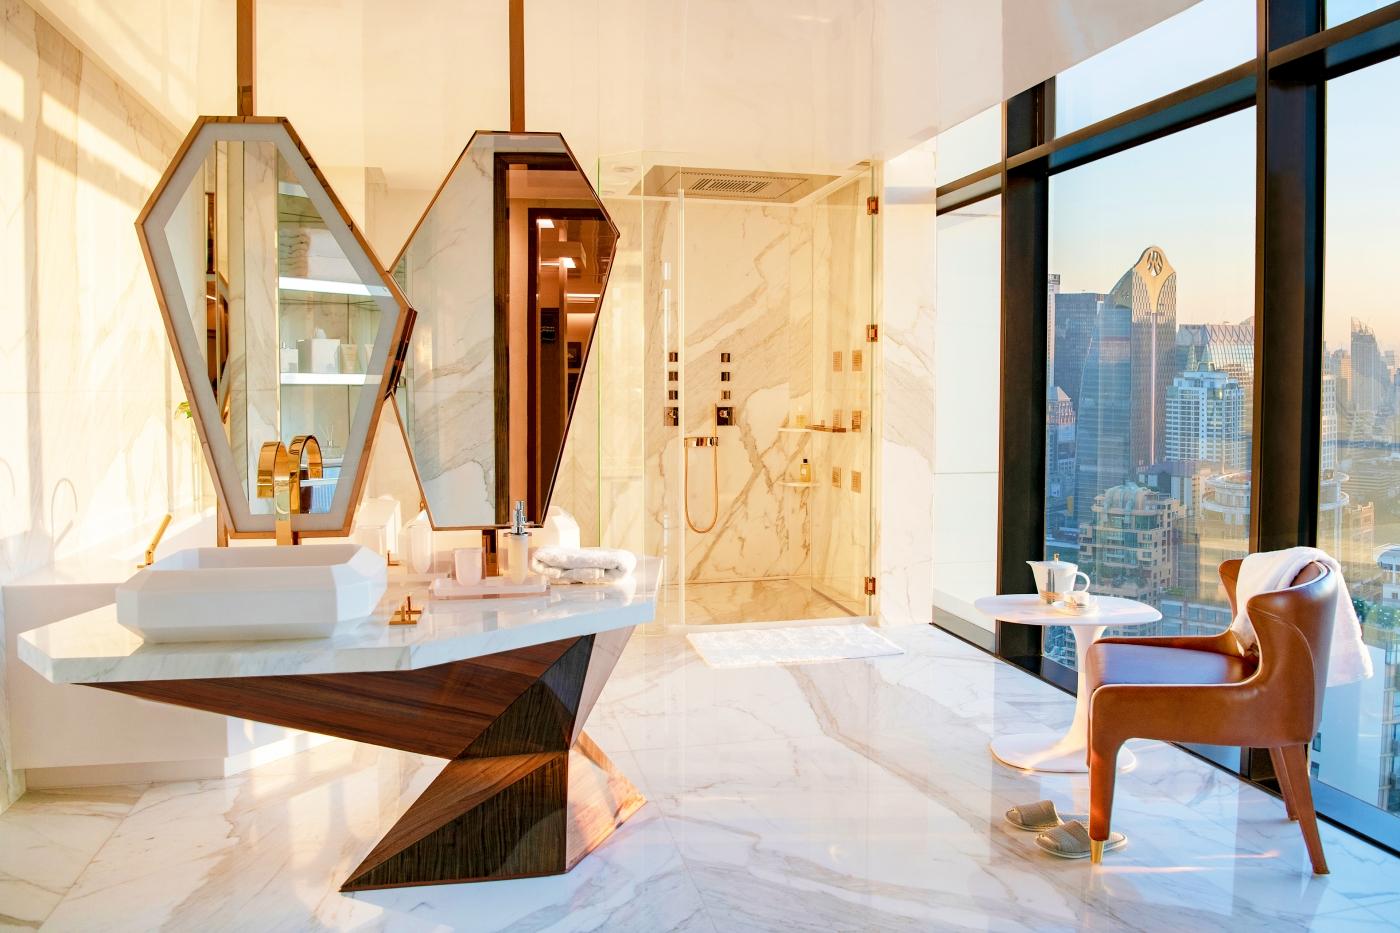 design intervention Design Intervention Turns A Bangkok Apartment Into A Stunning Abode 10 1 1400x933